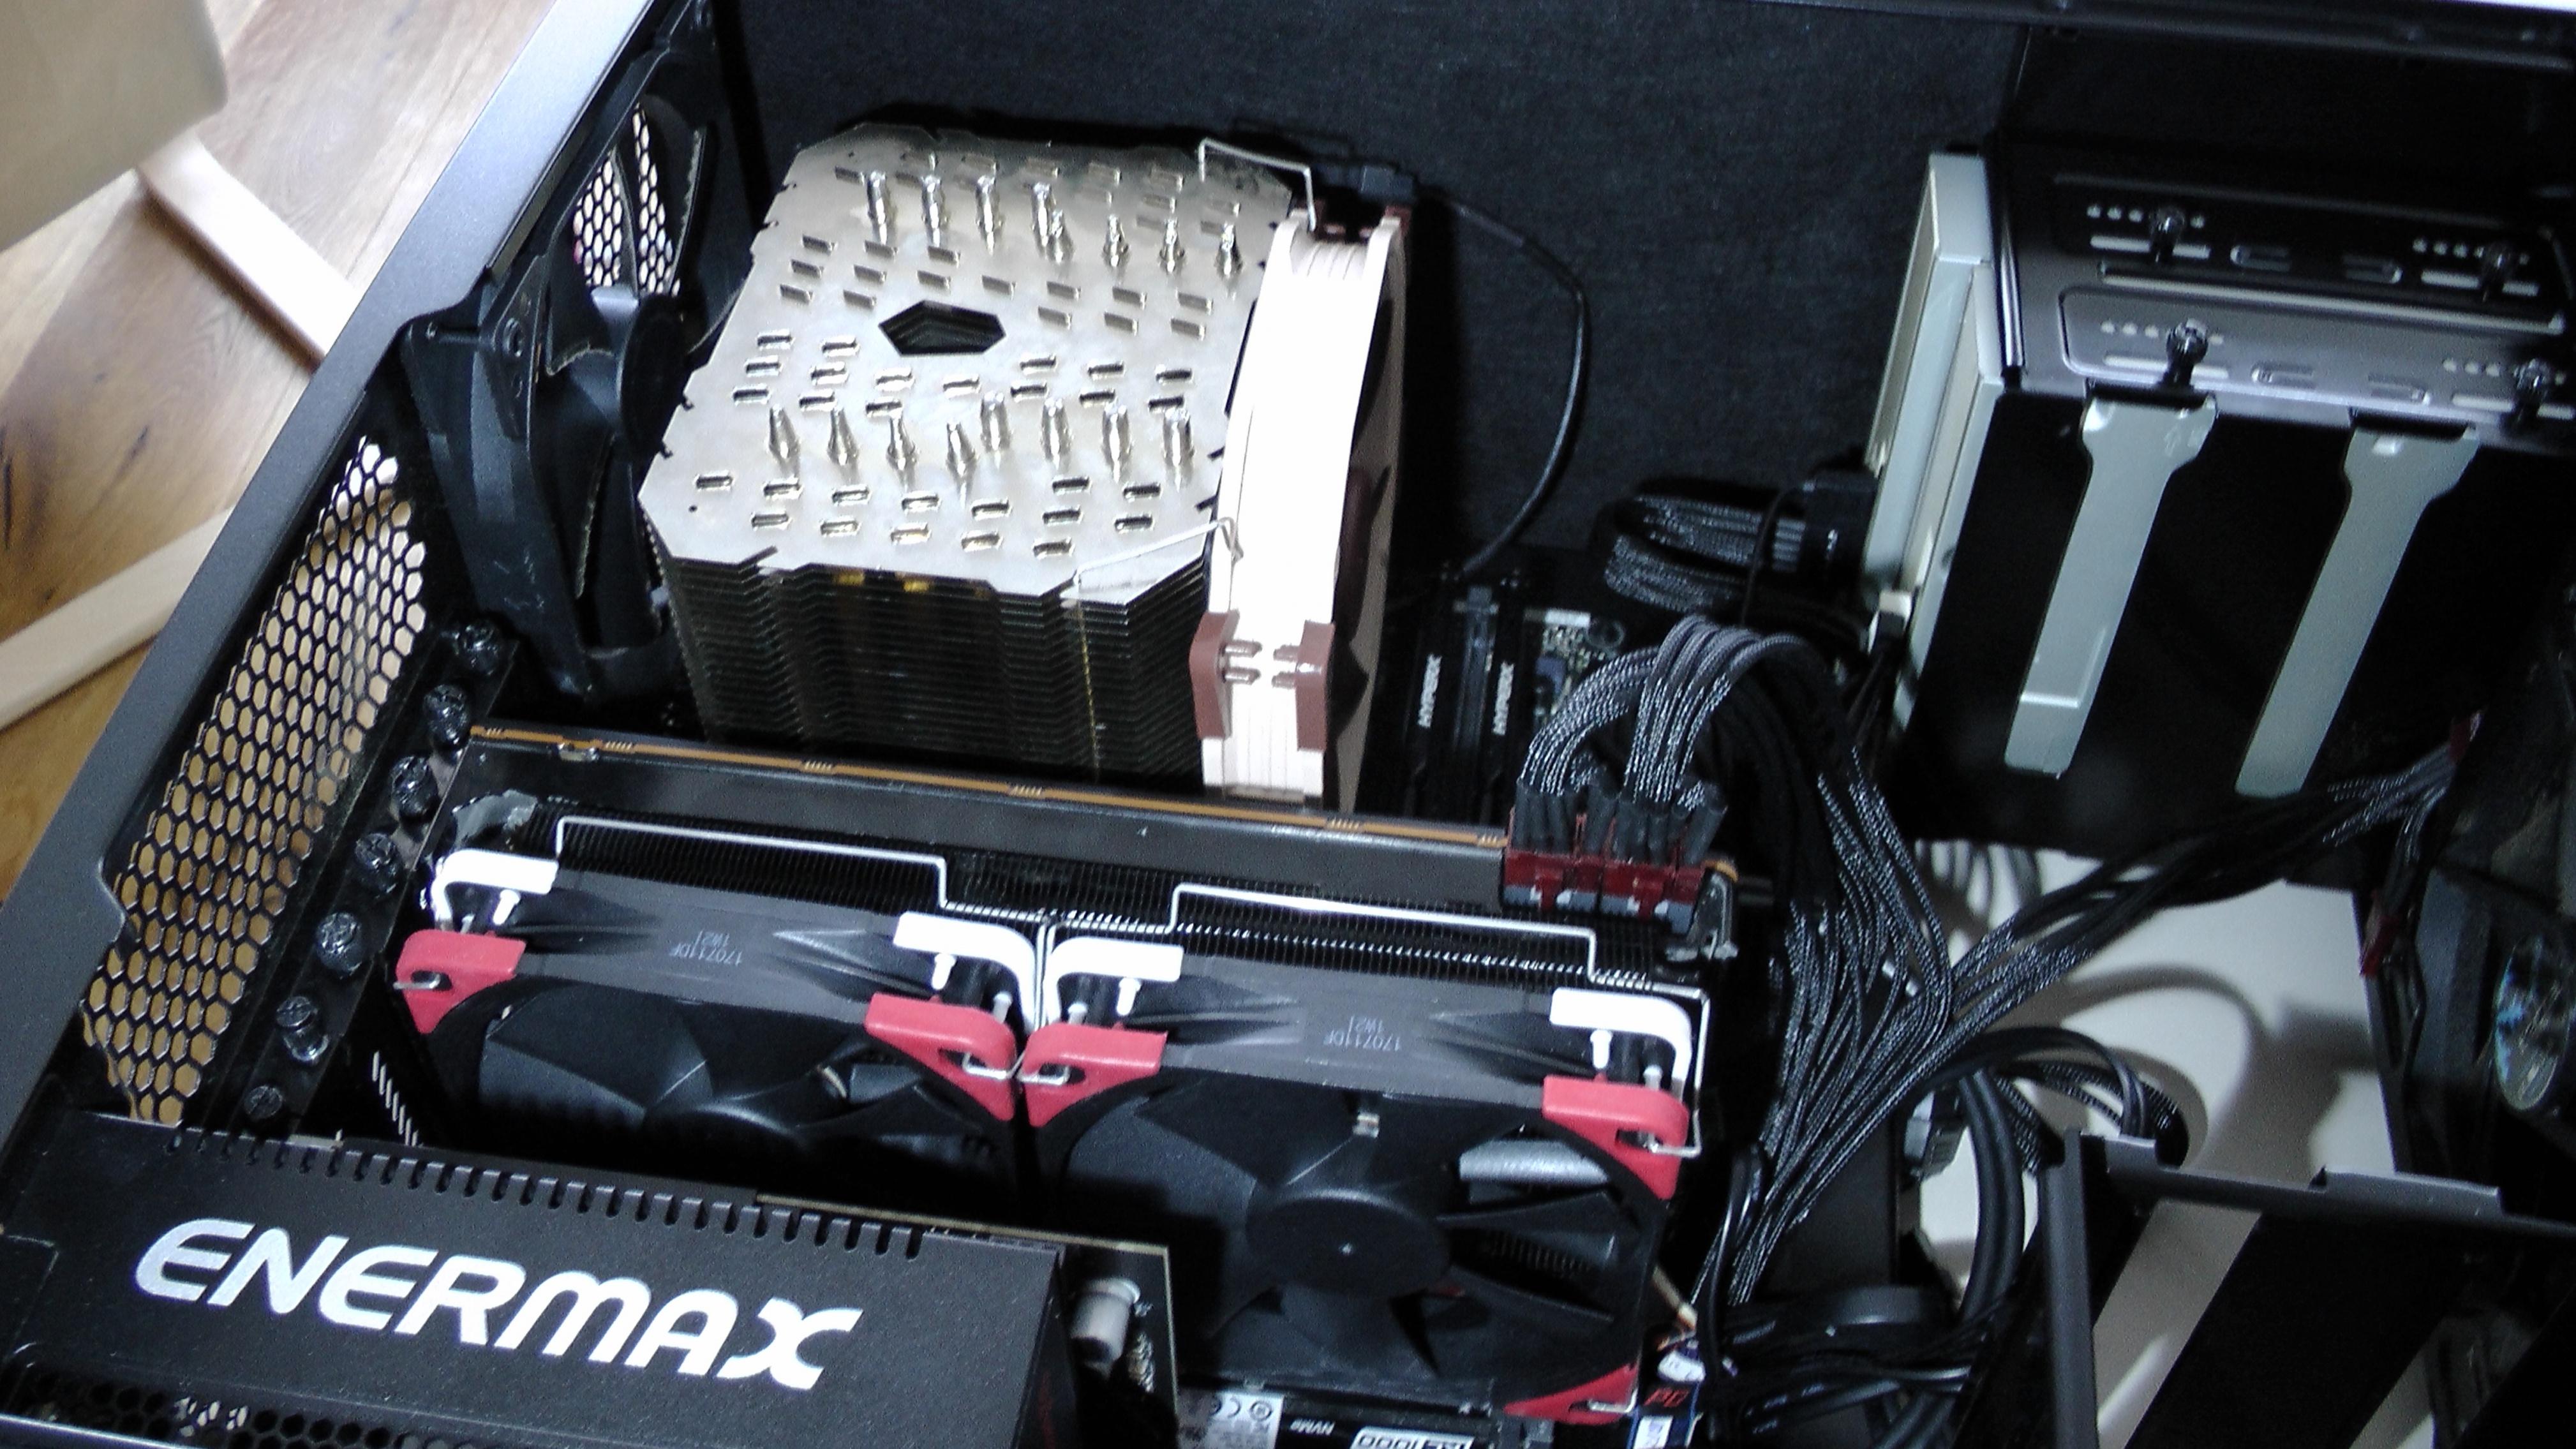 RX Vega 56 / 64 Overclocking & Undervolting Anleitung